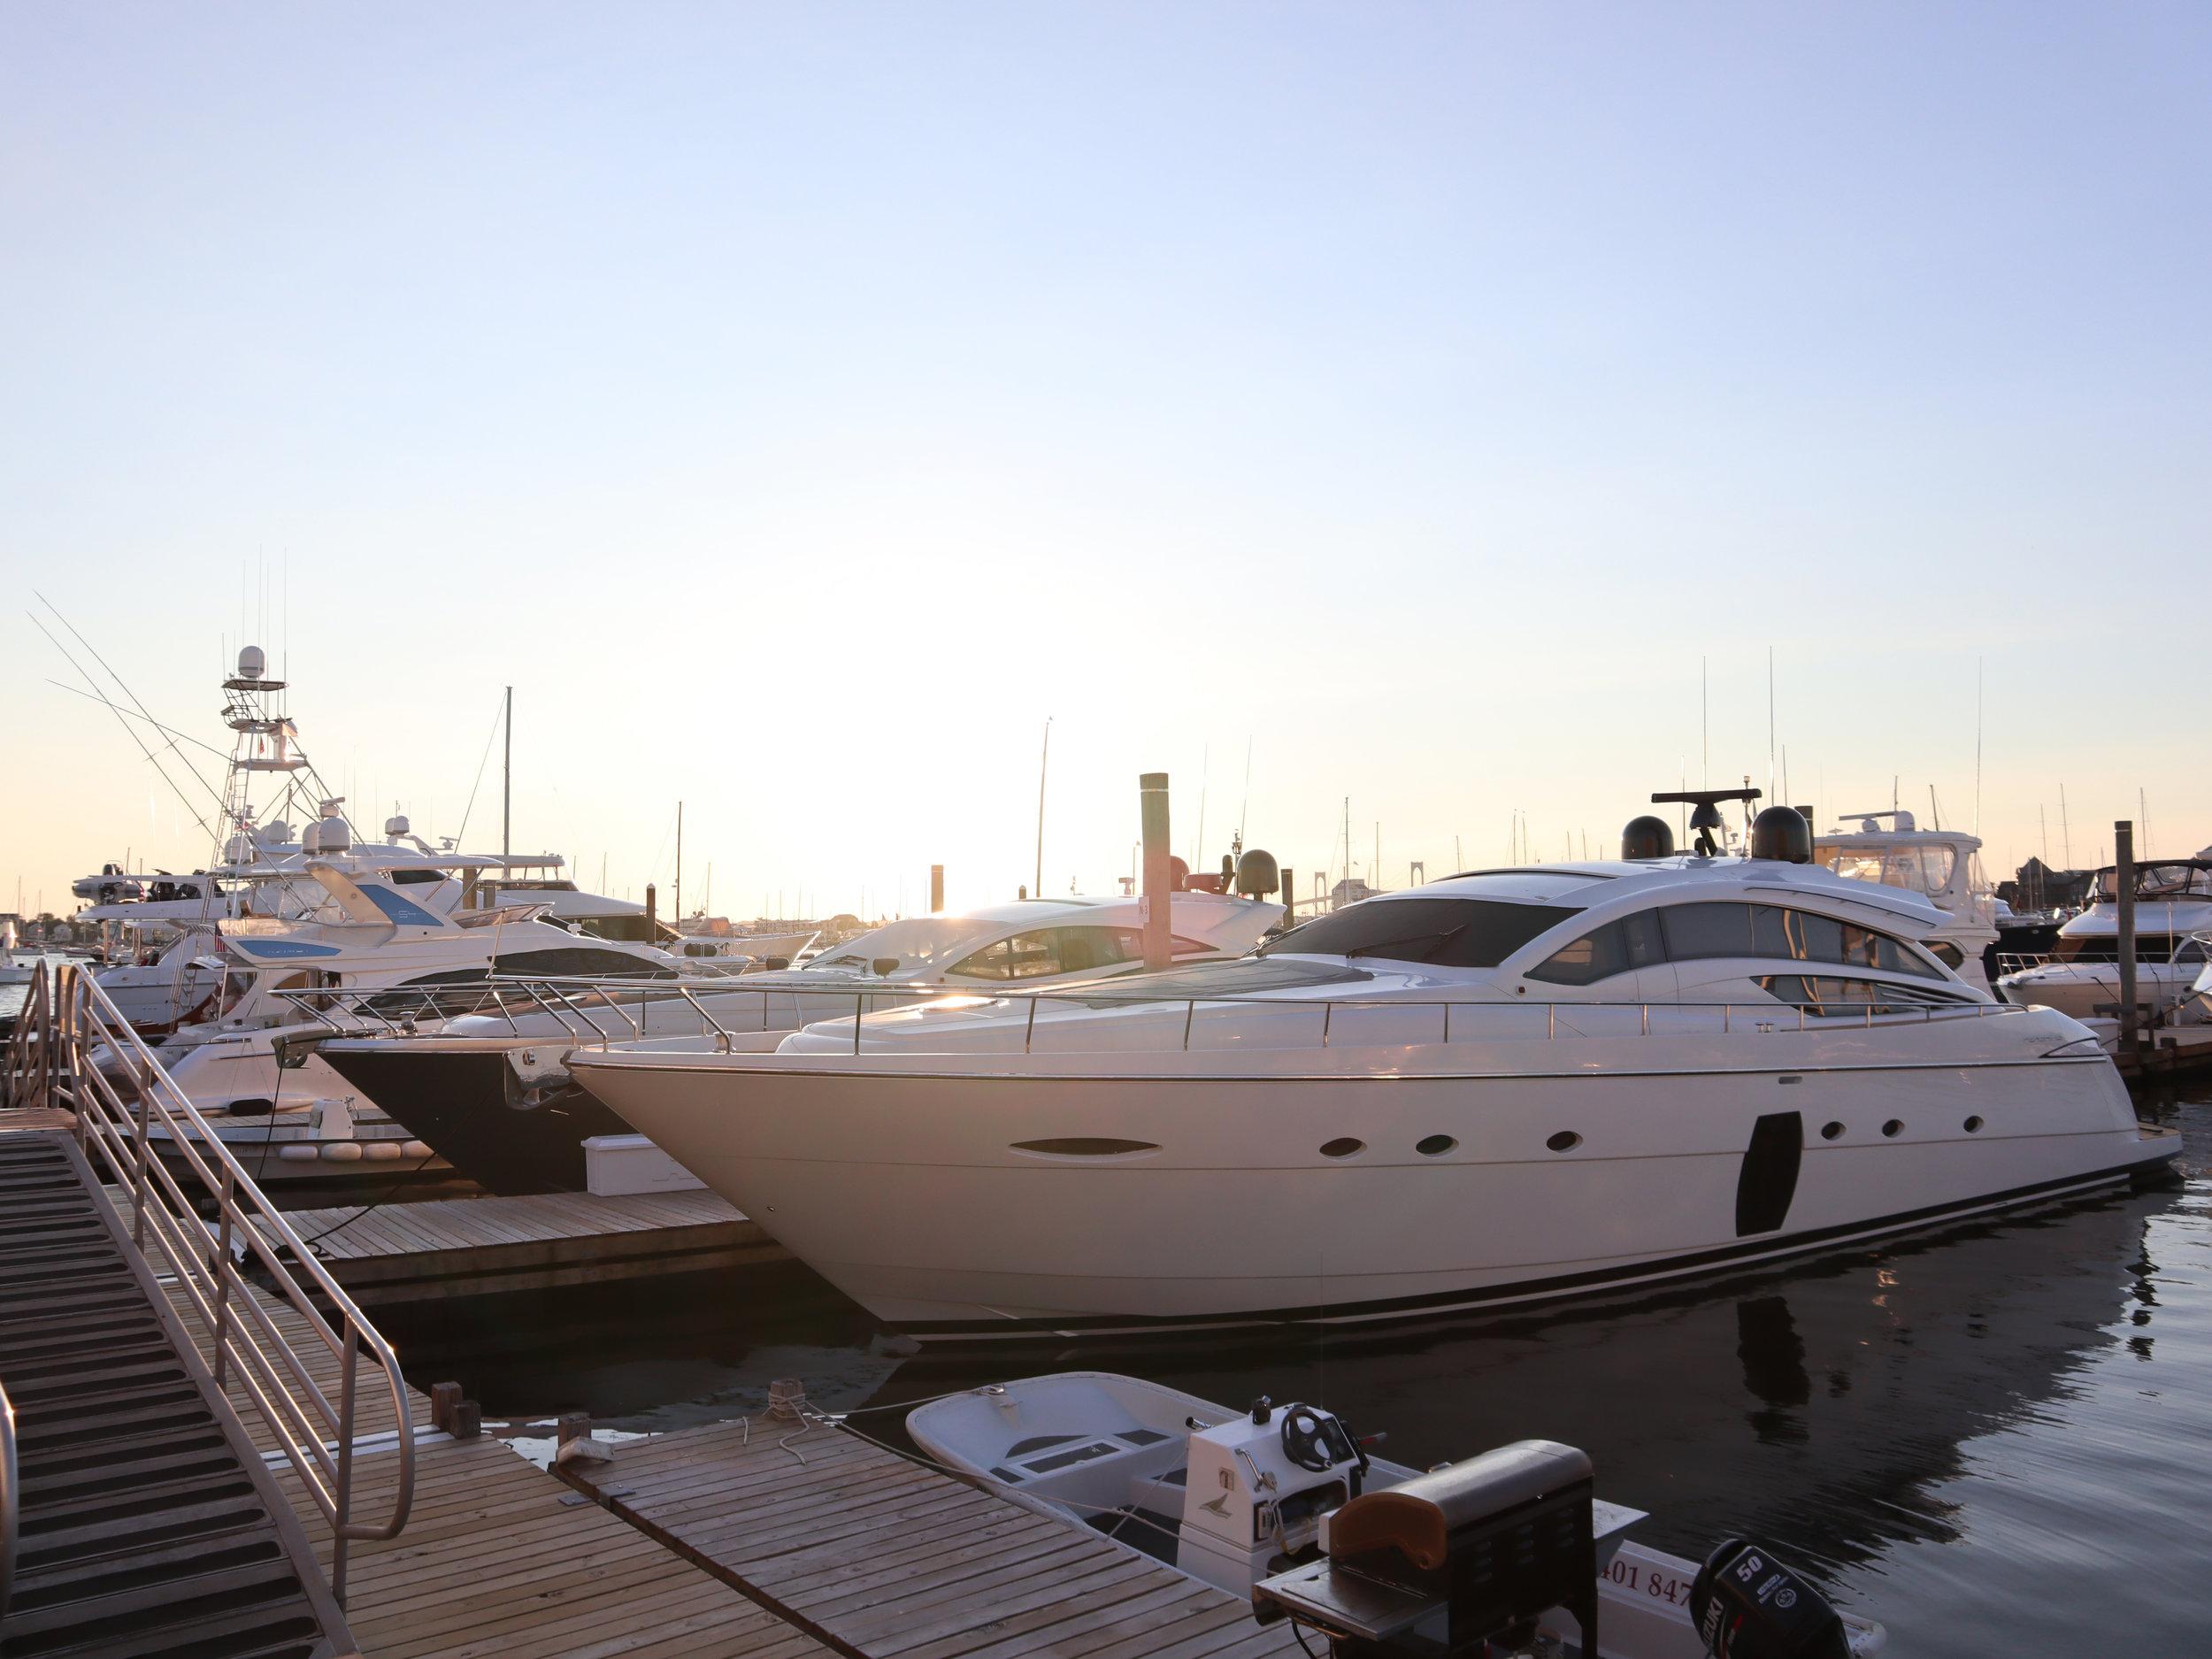 Набережная катера и лодки Ньюпорт Род Айленд.jpg